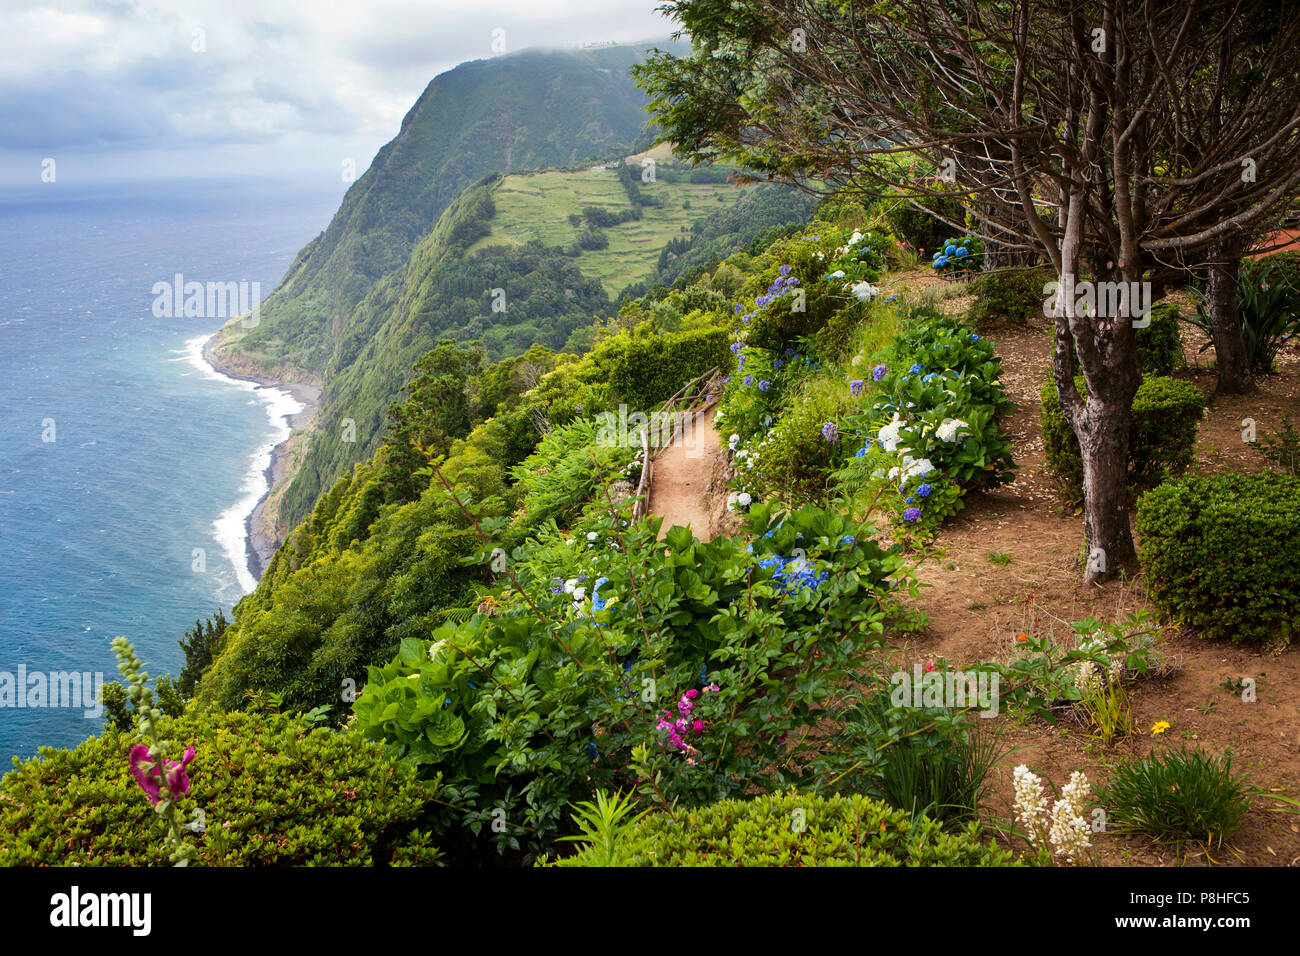 Aussichtspunkt Ponta do Sossego, Sao Miguel, Azoren, Portugal Stockbild